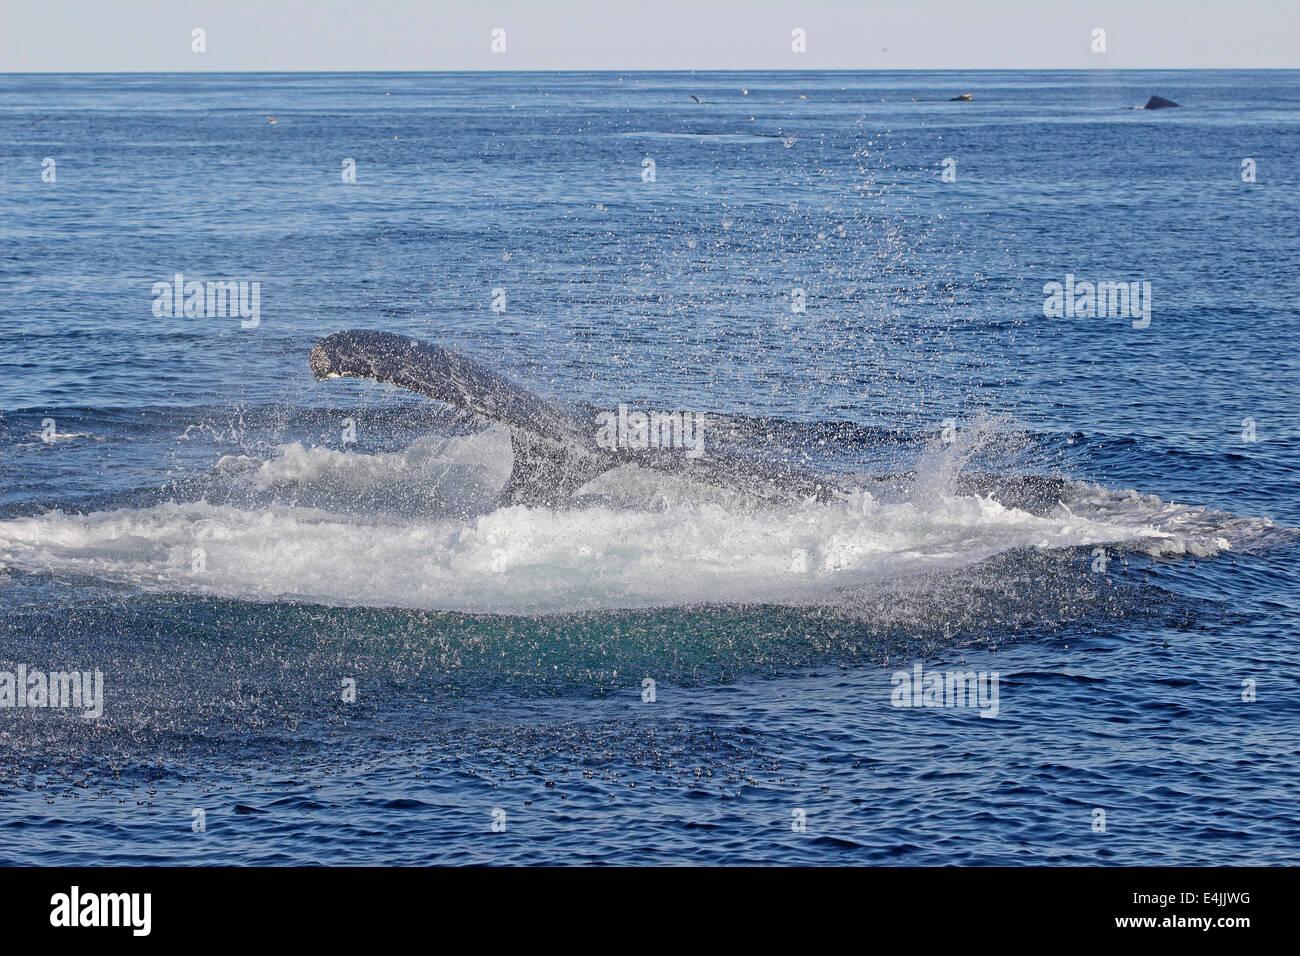 Humpback whale (Megaptera novaeangliae) feeding breaching - Stock Image